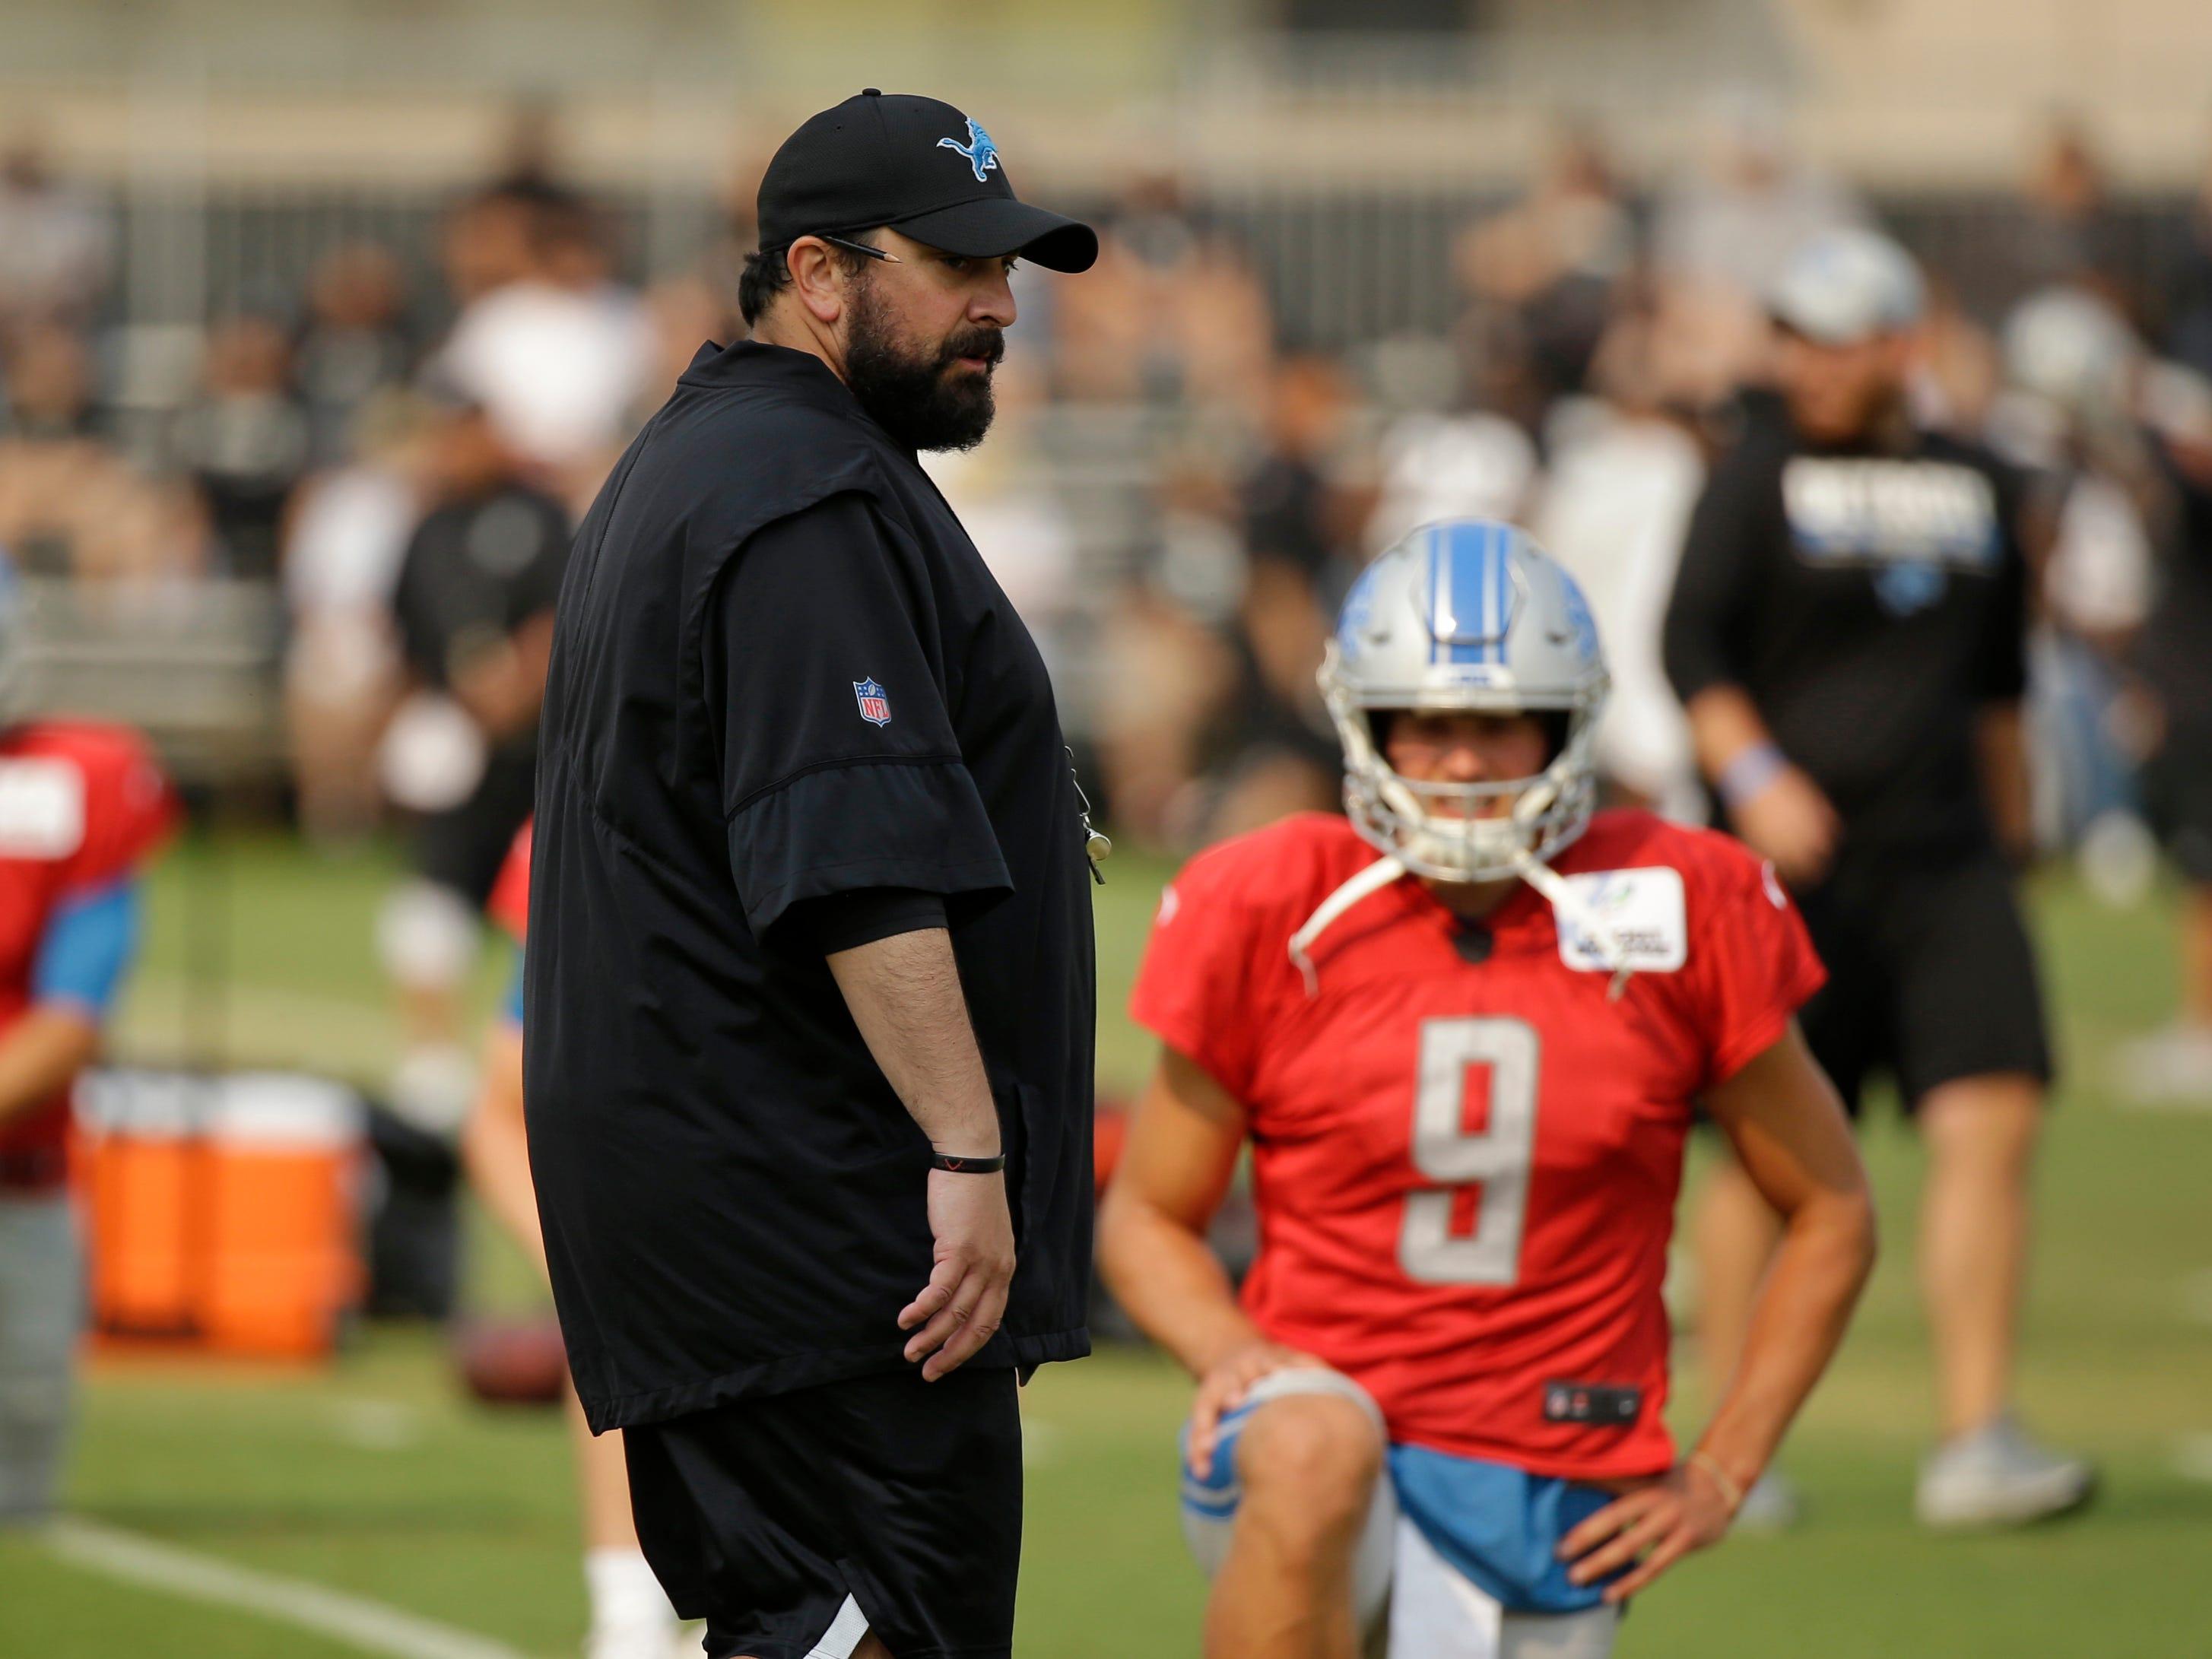 Detroit Lions head coach Matt Patricia watches players stretch as quarterback Matthew Stafford looks on.